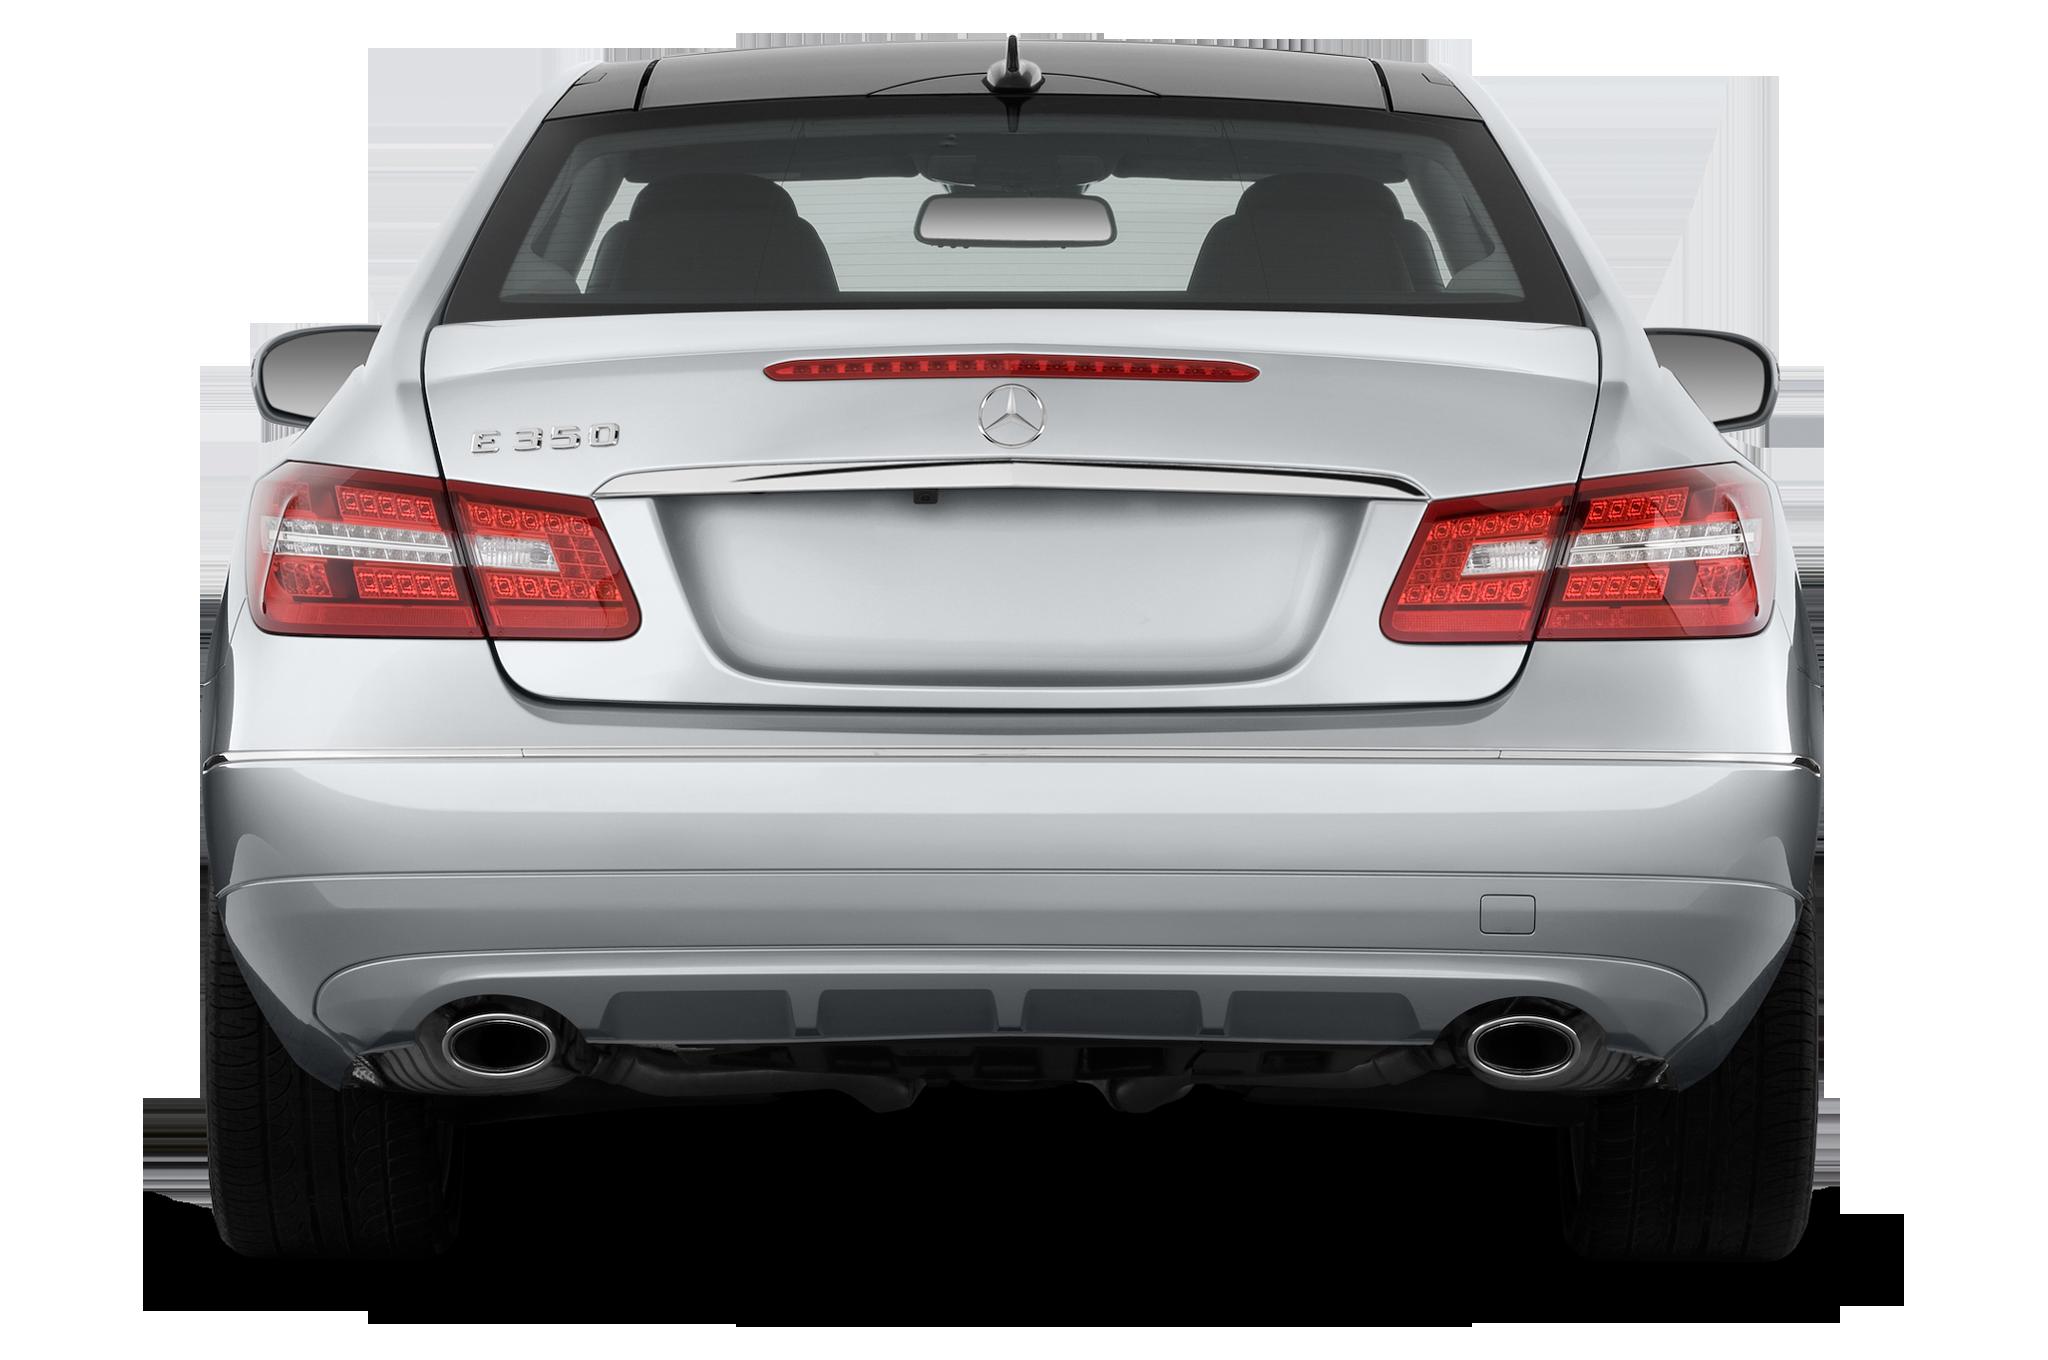 2010 mercedes benz e class sedan mercedes benz luxury sedan review automobile magazine. Black Bedroom Furniture Sets. Home Design Ideas